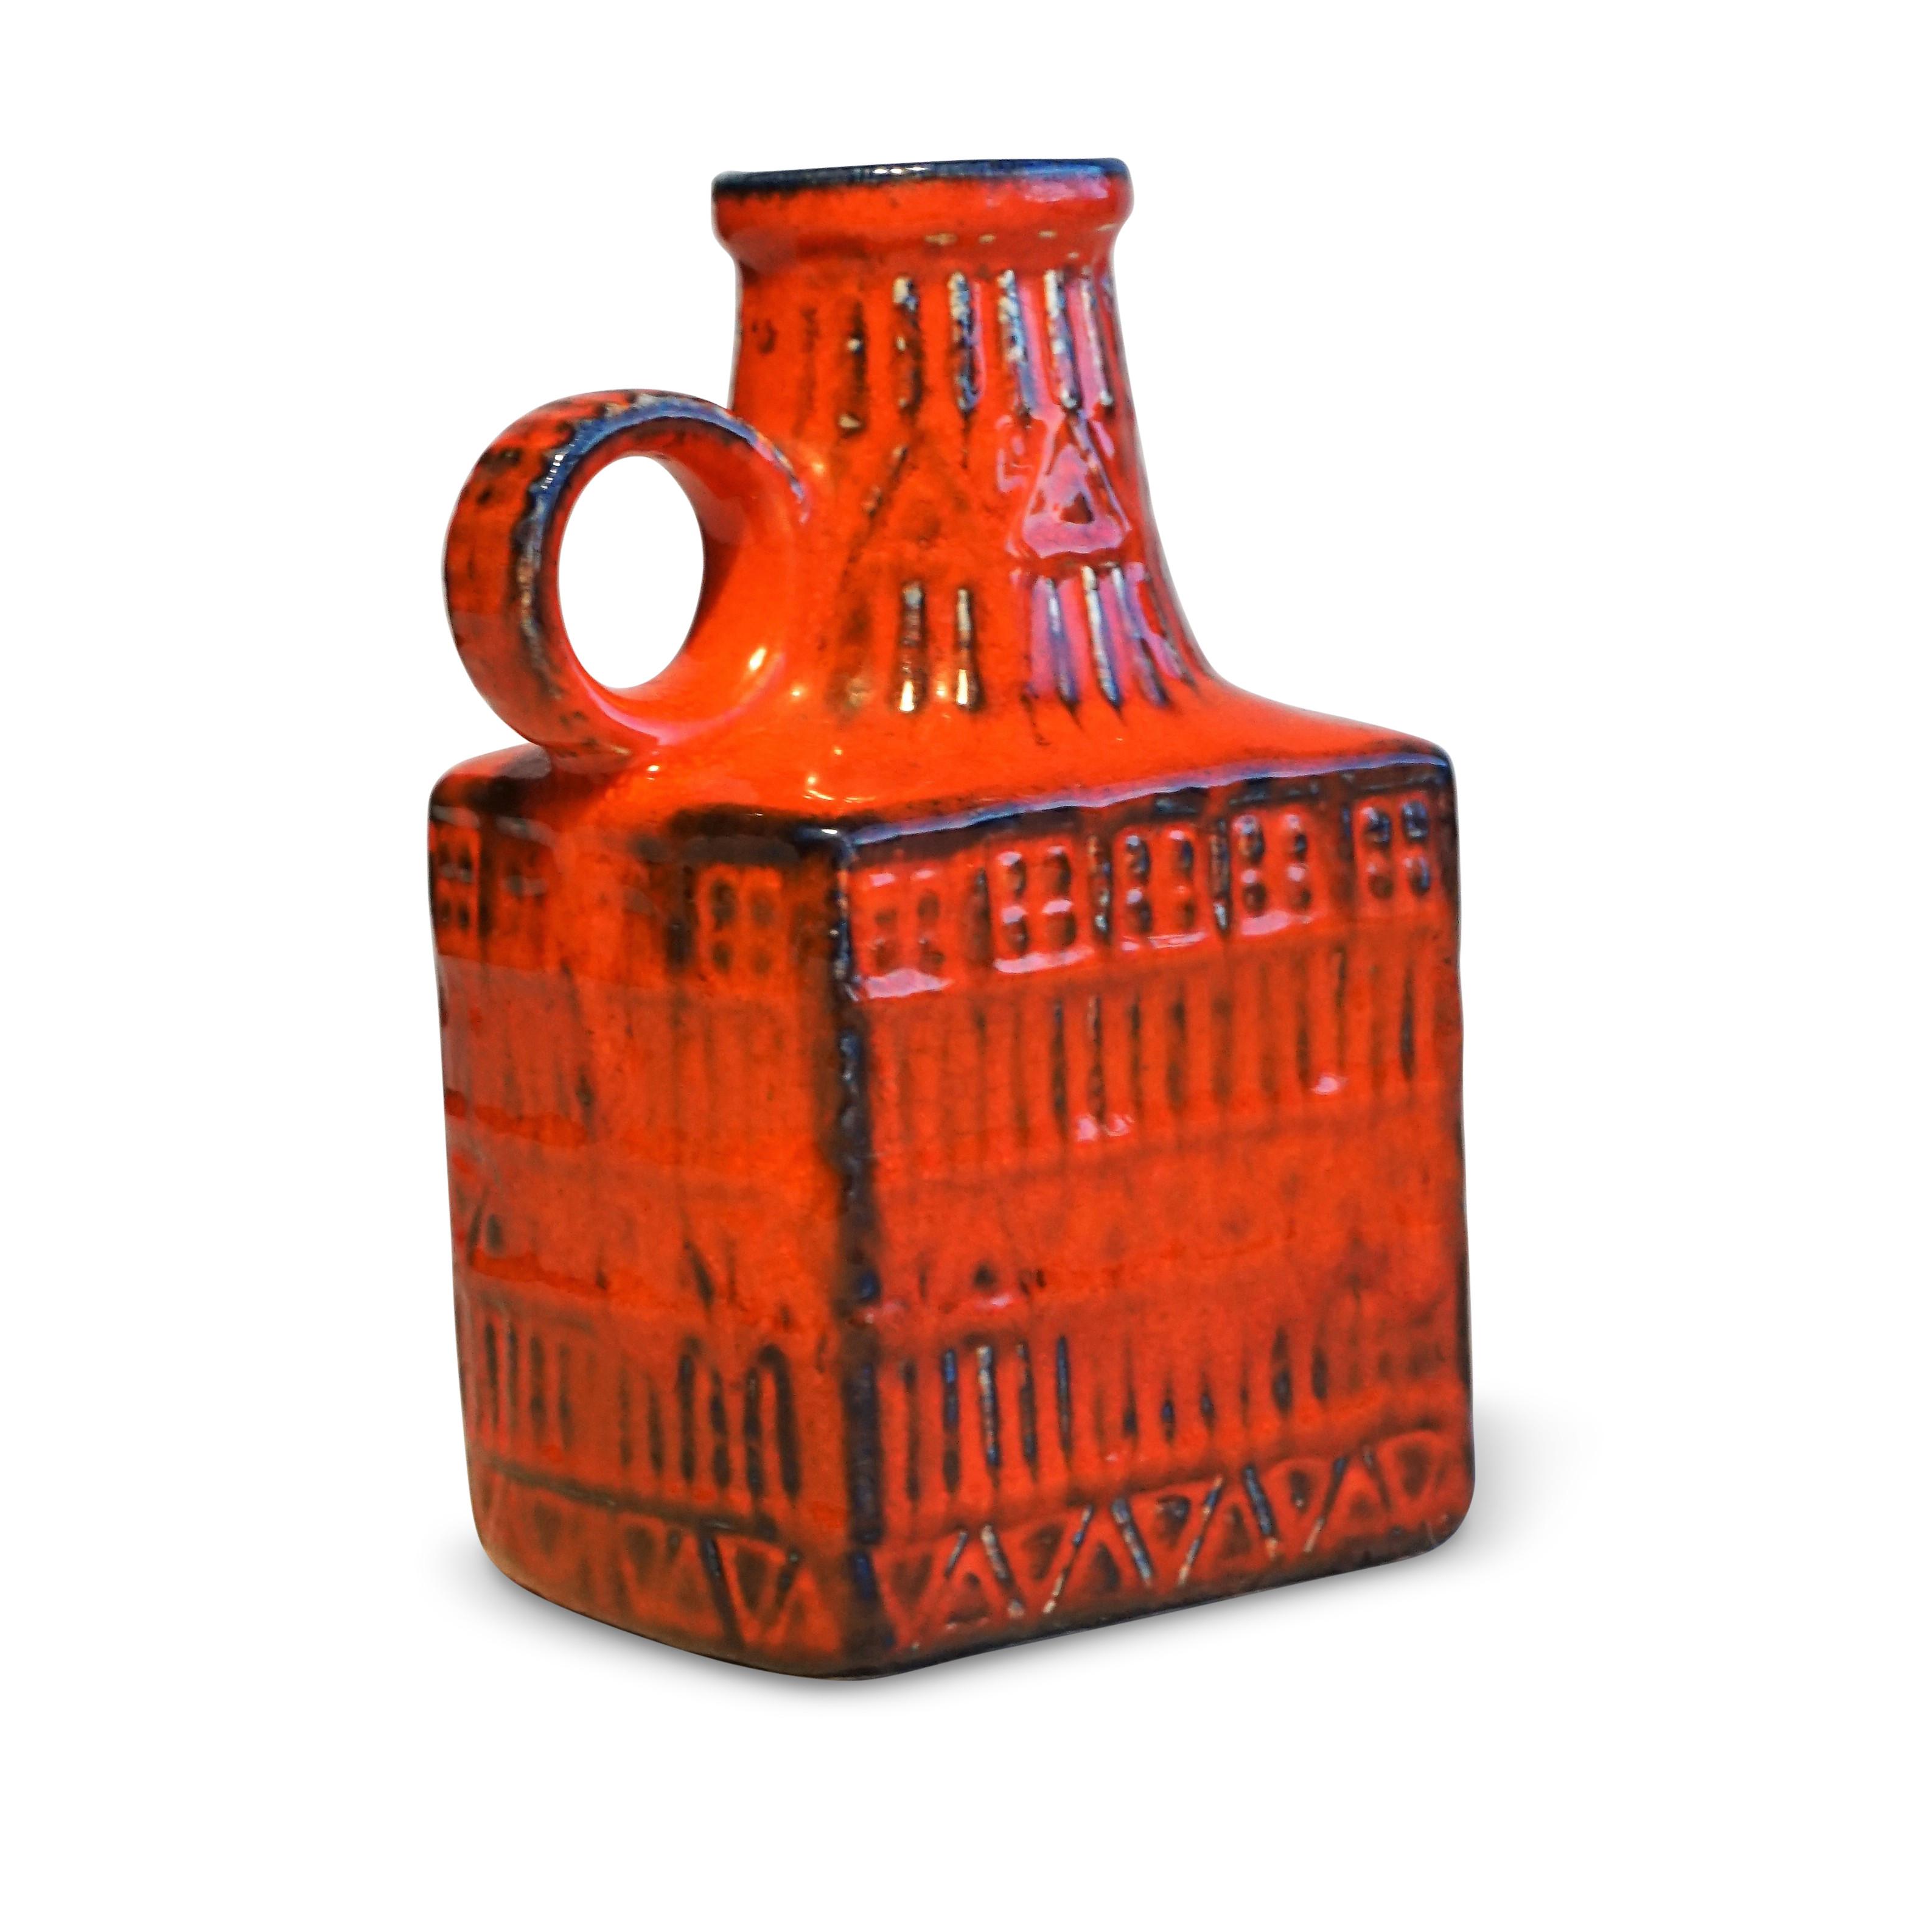 Lanoba danish vintage design decoration west germany vase reviewsmspy